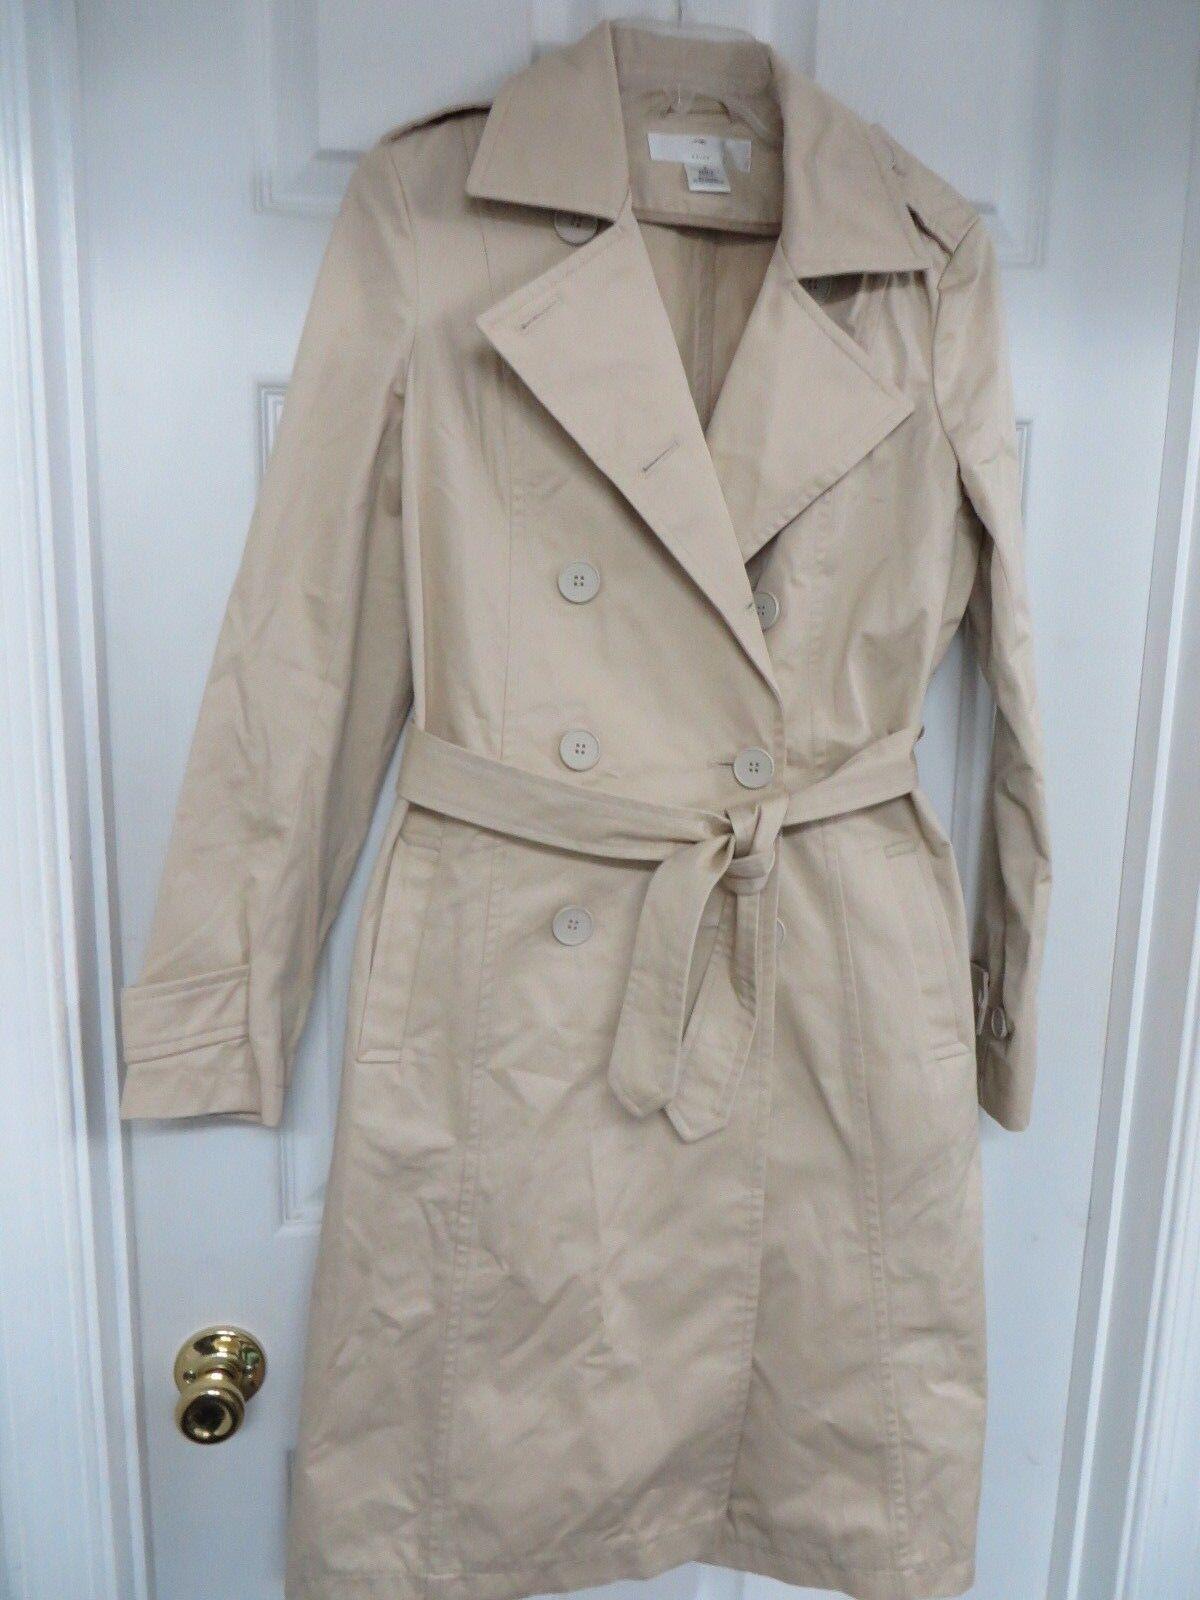 Retail  320 ETIQUETA NEGRA Twill Trenchcoat Double breasted Tan Medium NWOT